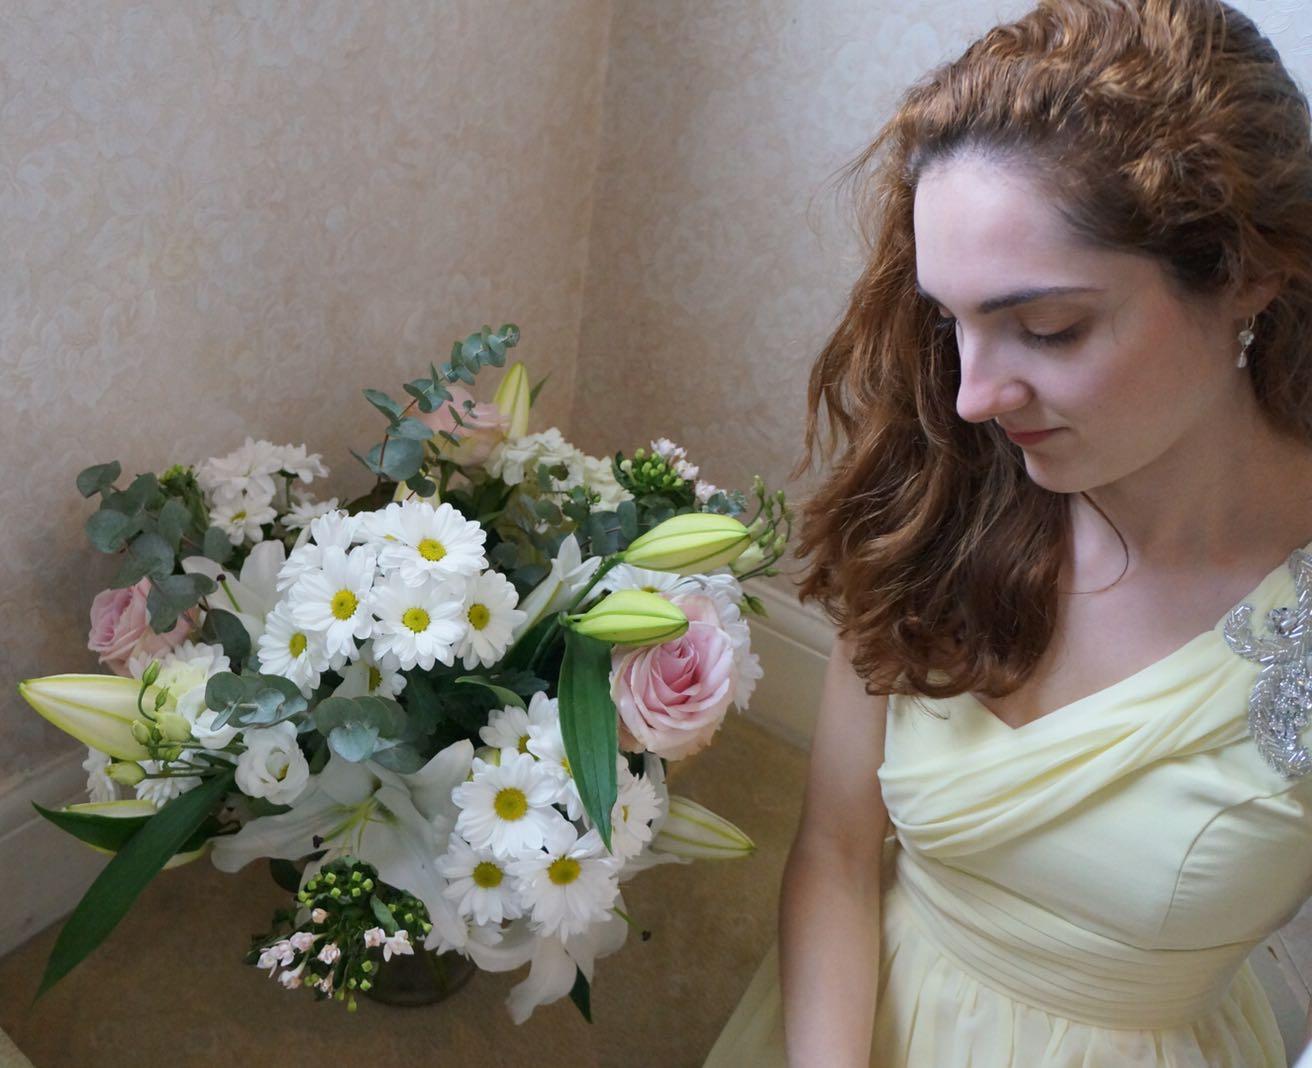 lemon dress and flowers